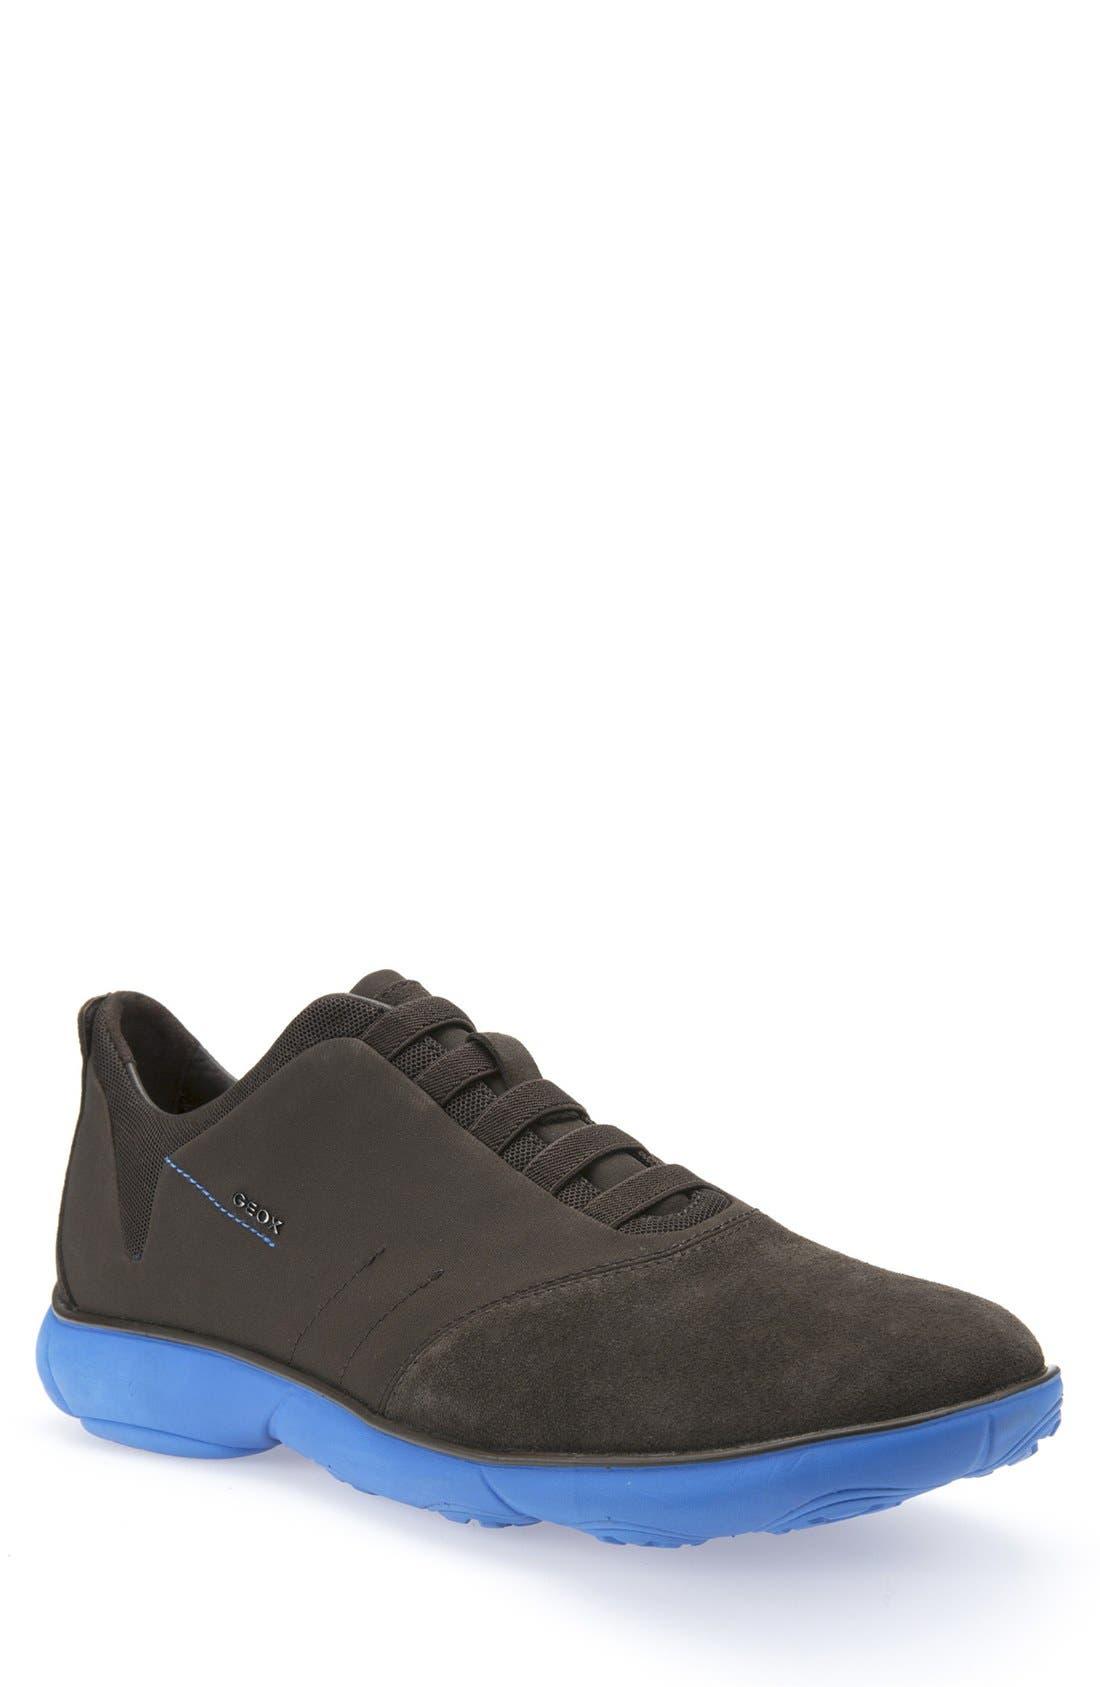 Main Image - Geox 'Nebula 24' Slip-On Sneaker (Men)